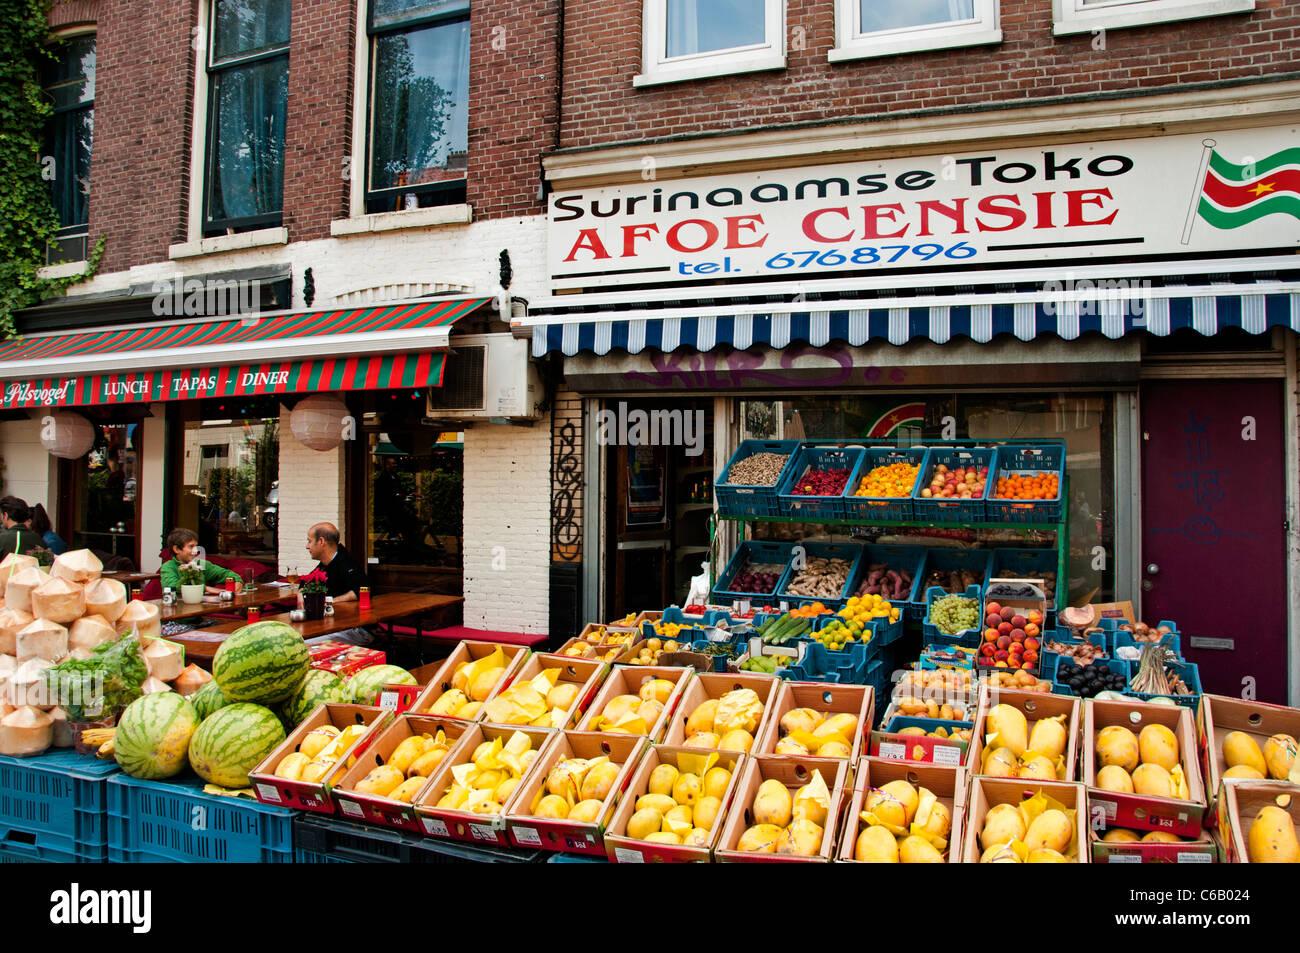 surinaamse toko amsterdam albert cuypstraat cuyp market